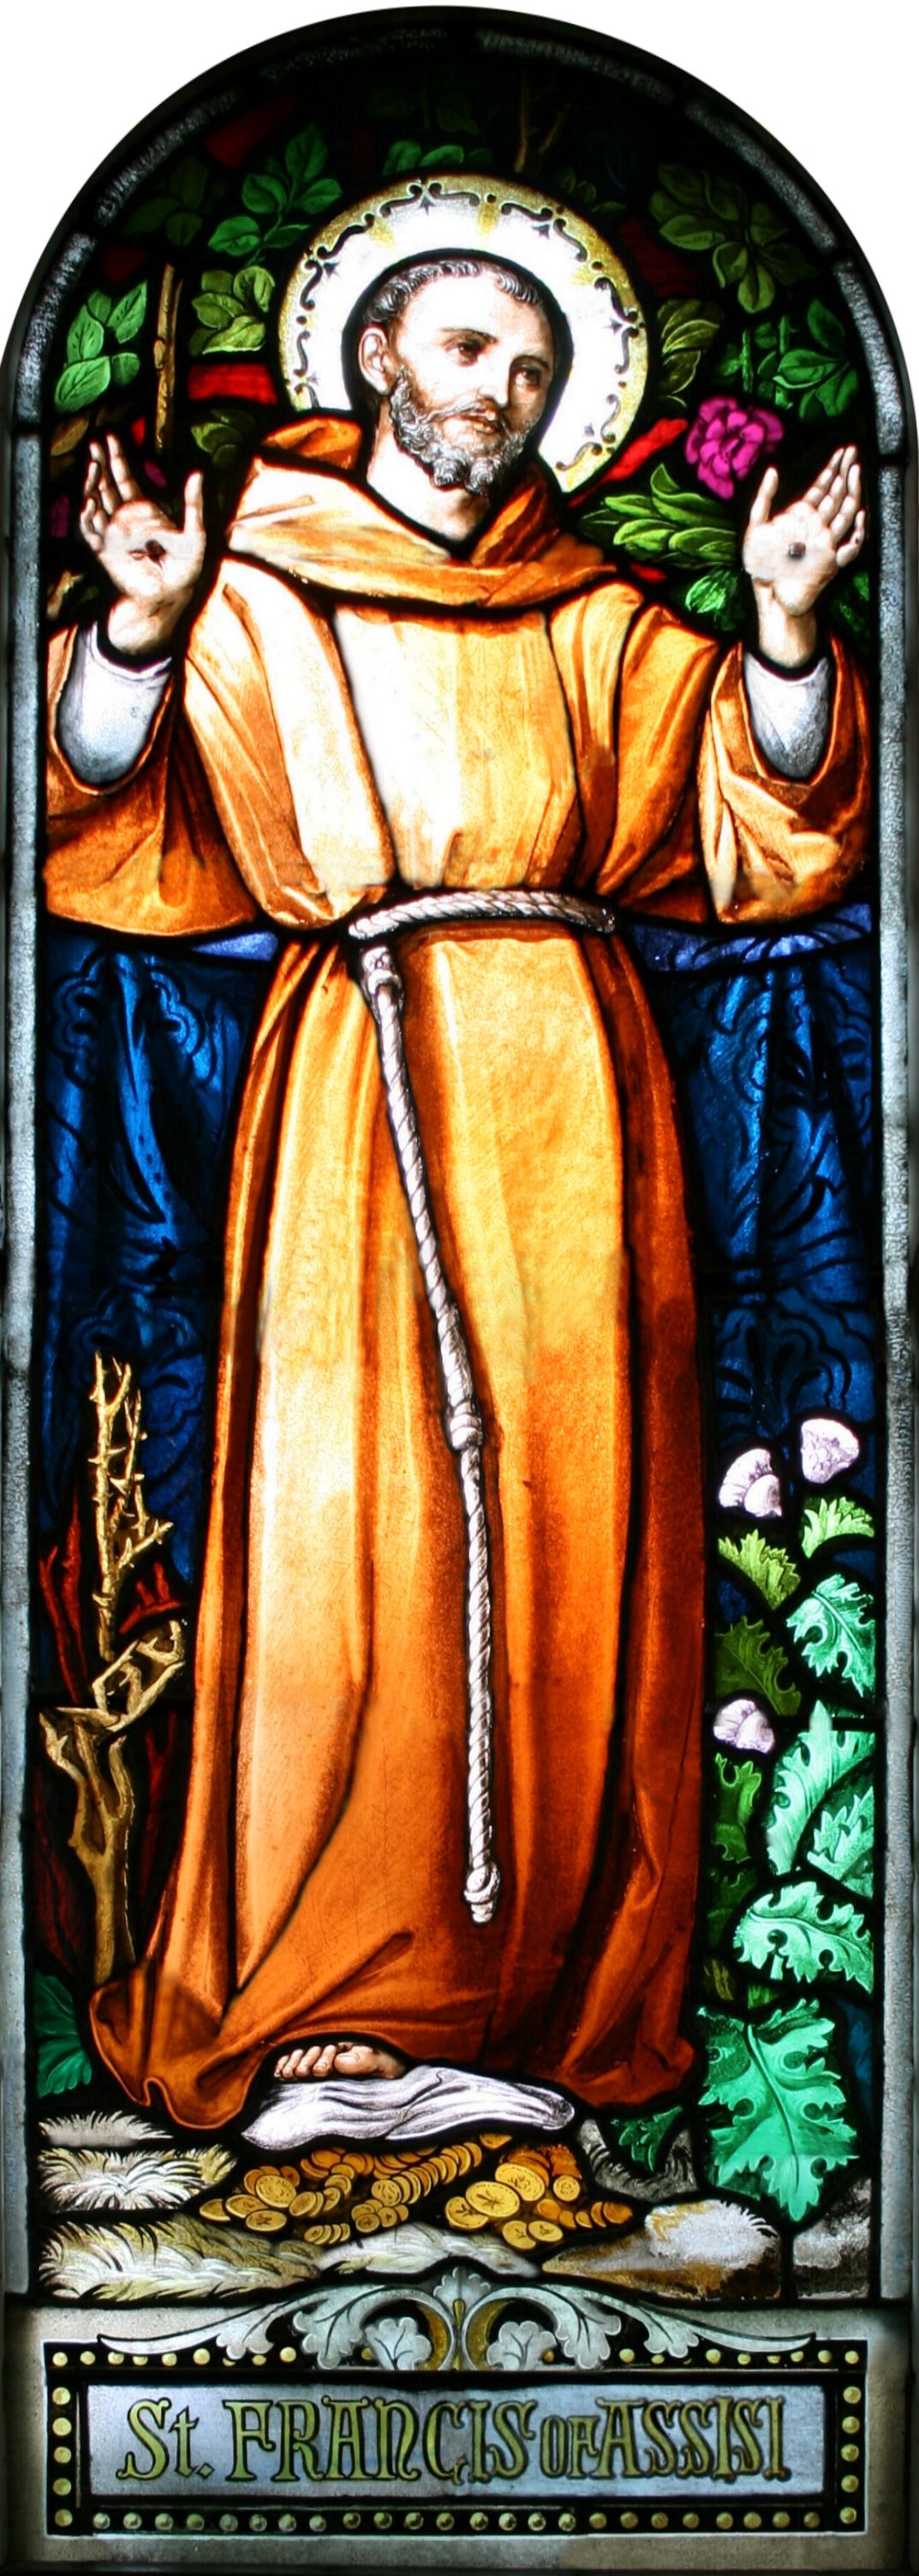 a biography of francis of assisi Saint francis of assisi (italian: san francesco d'assisi, latin: sanctus franciscus assisiensis), born giovanni di pietro di bernardone, informally named as francesco (1181/1182 - 3 october 1226.